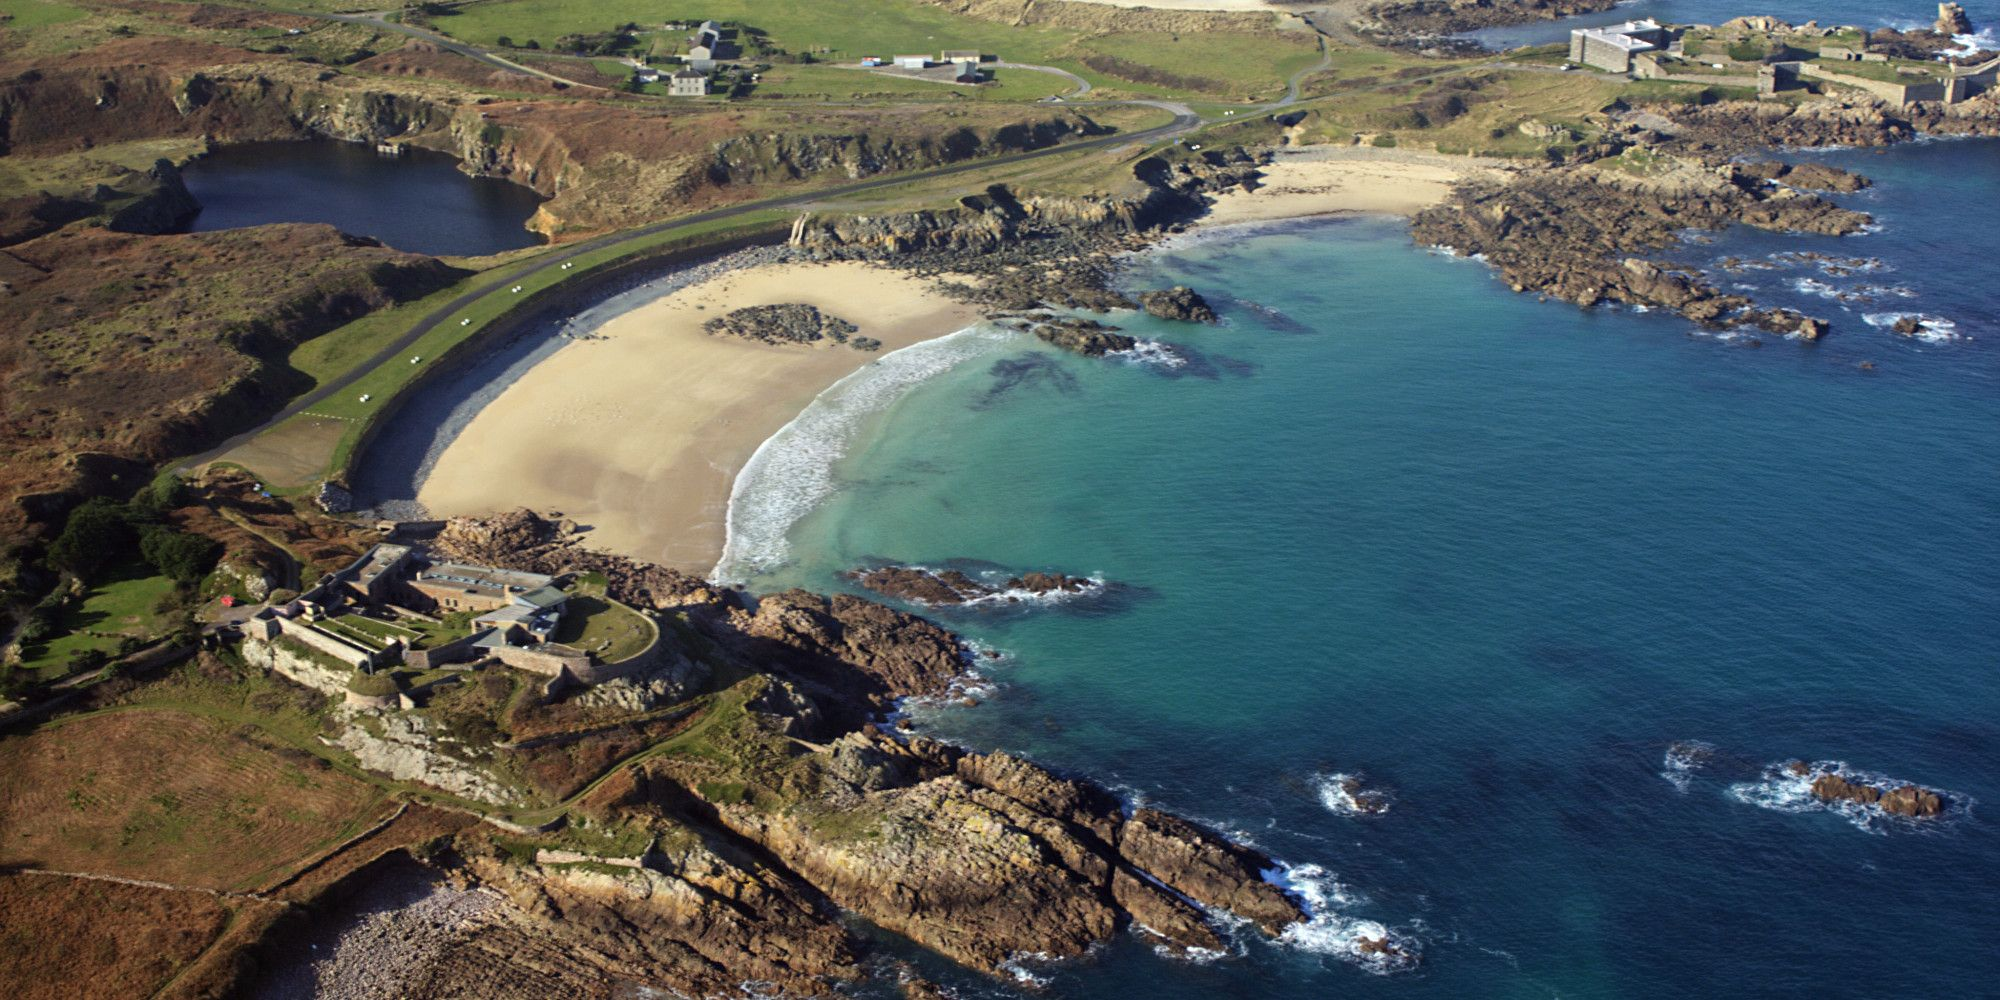 Travel Eye: Visit the beautiful Islands of Guernsey and Herm  http://www.huffingtonpost.co.uk/karen-edwards/guernsey-travel_b_4035086.html